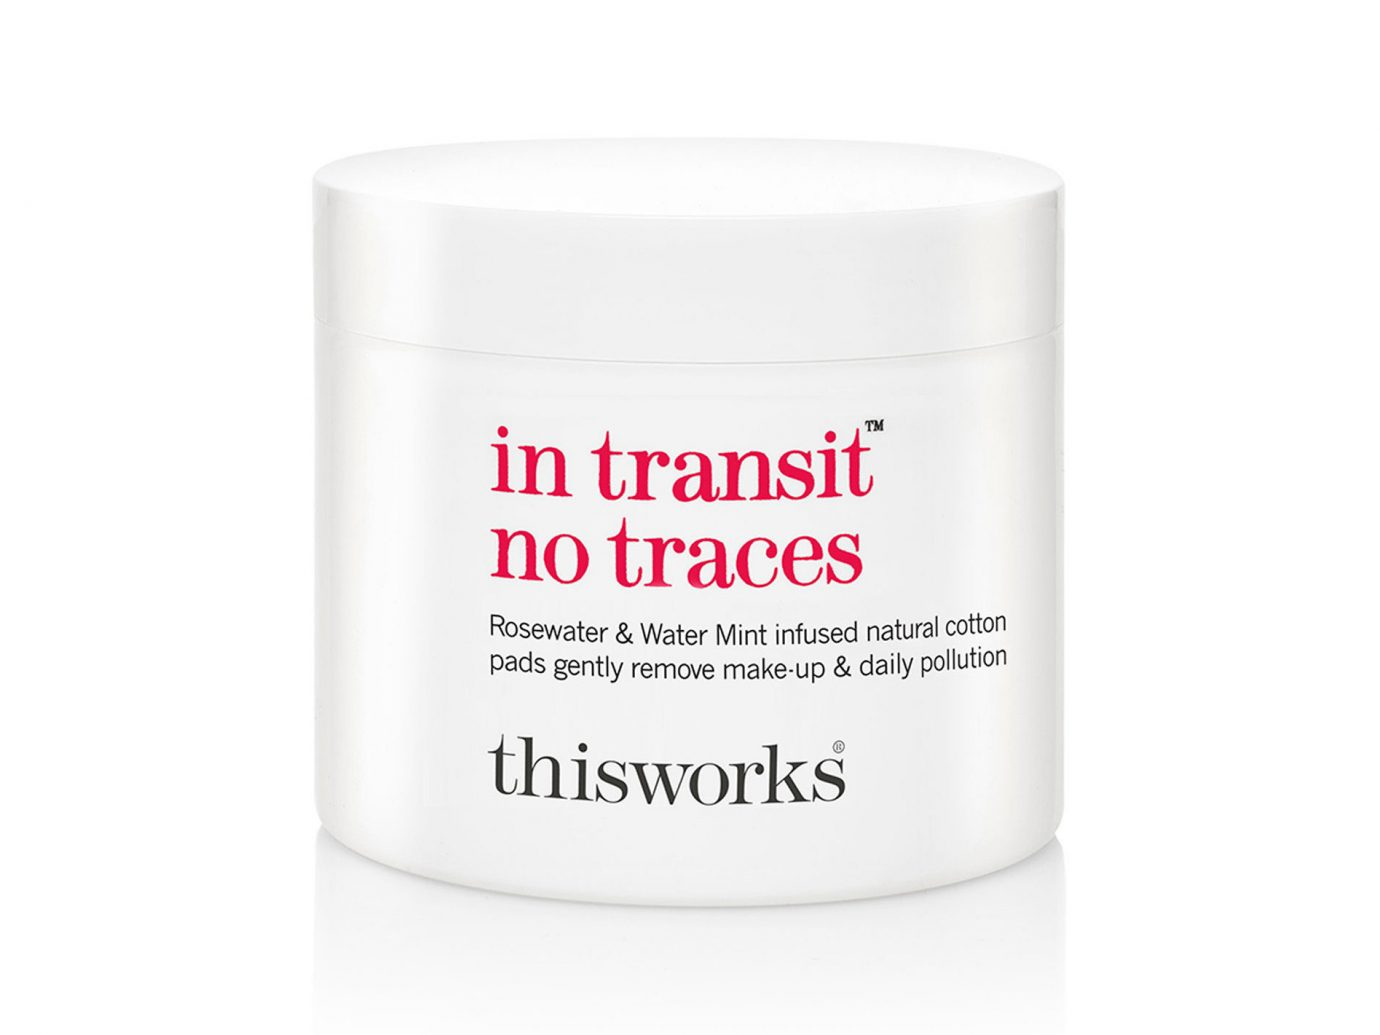 Flights Travel Shop toiletry cream product skin care health & beauty